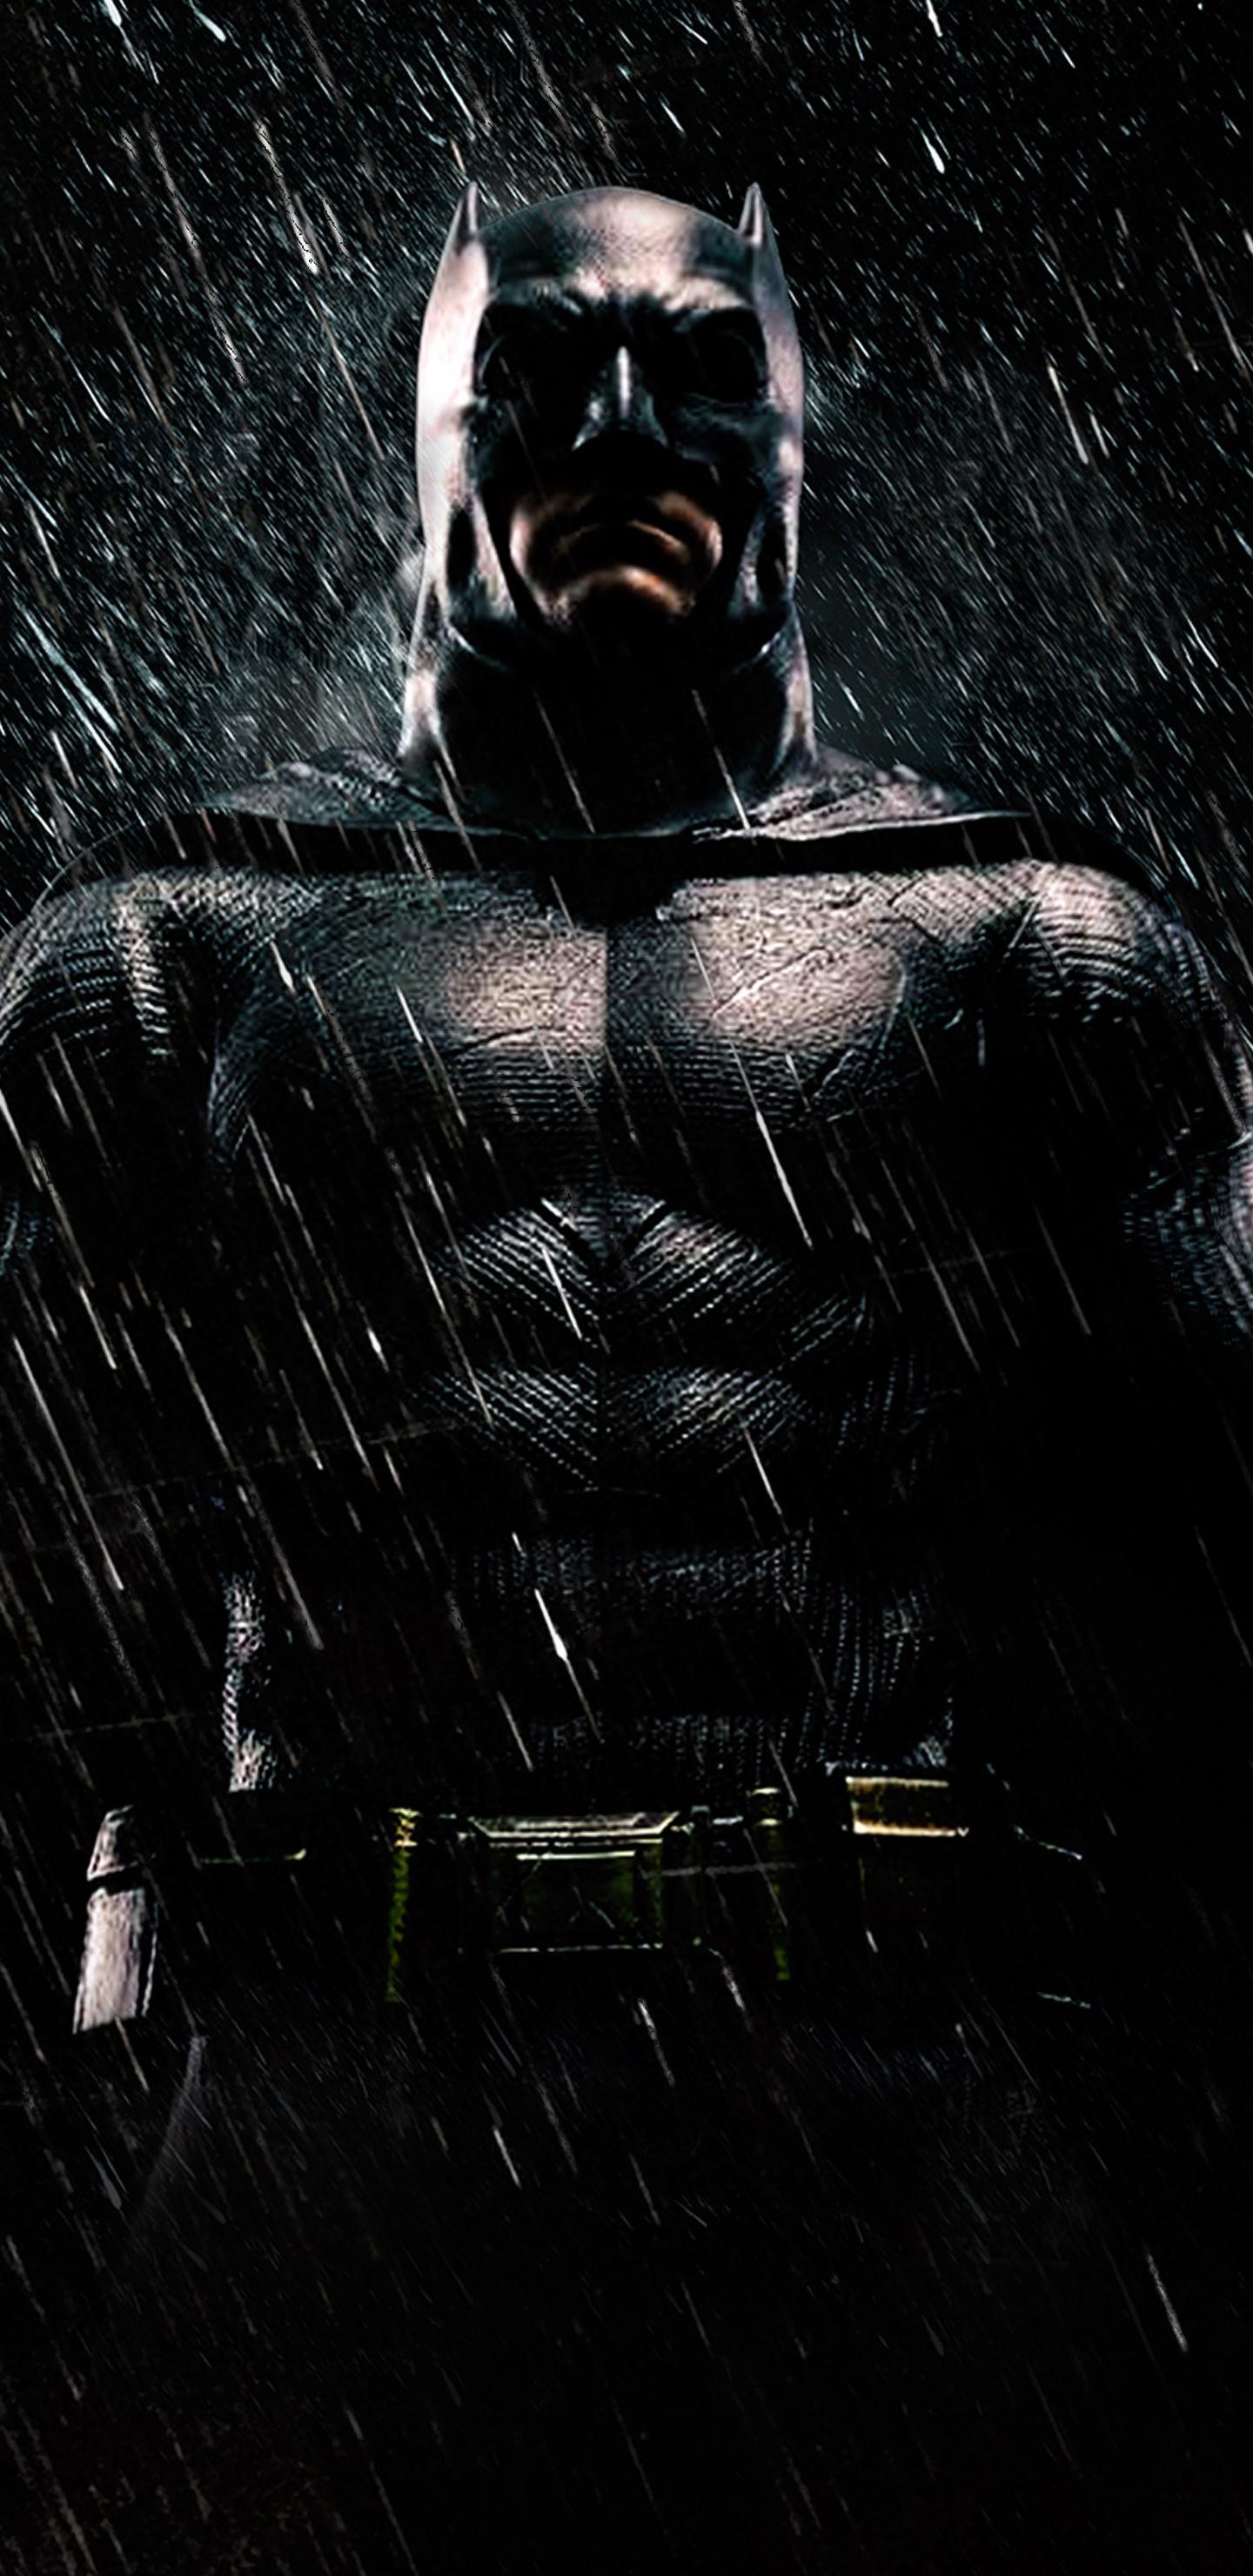 batman-in-the-rain-5w.jpg